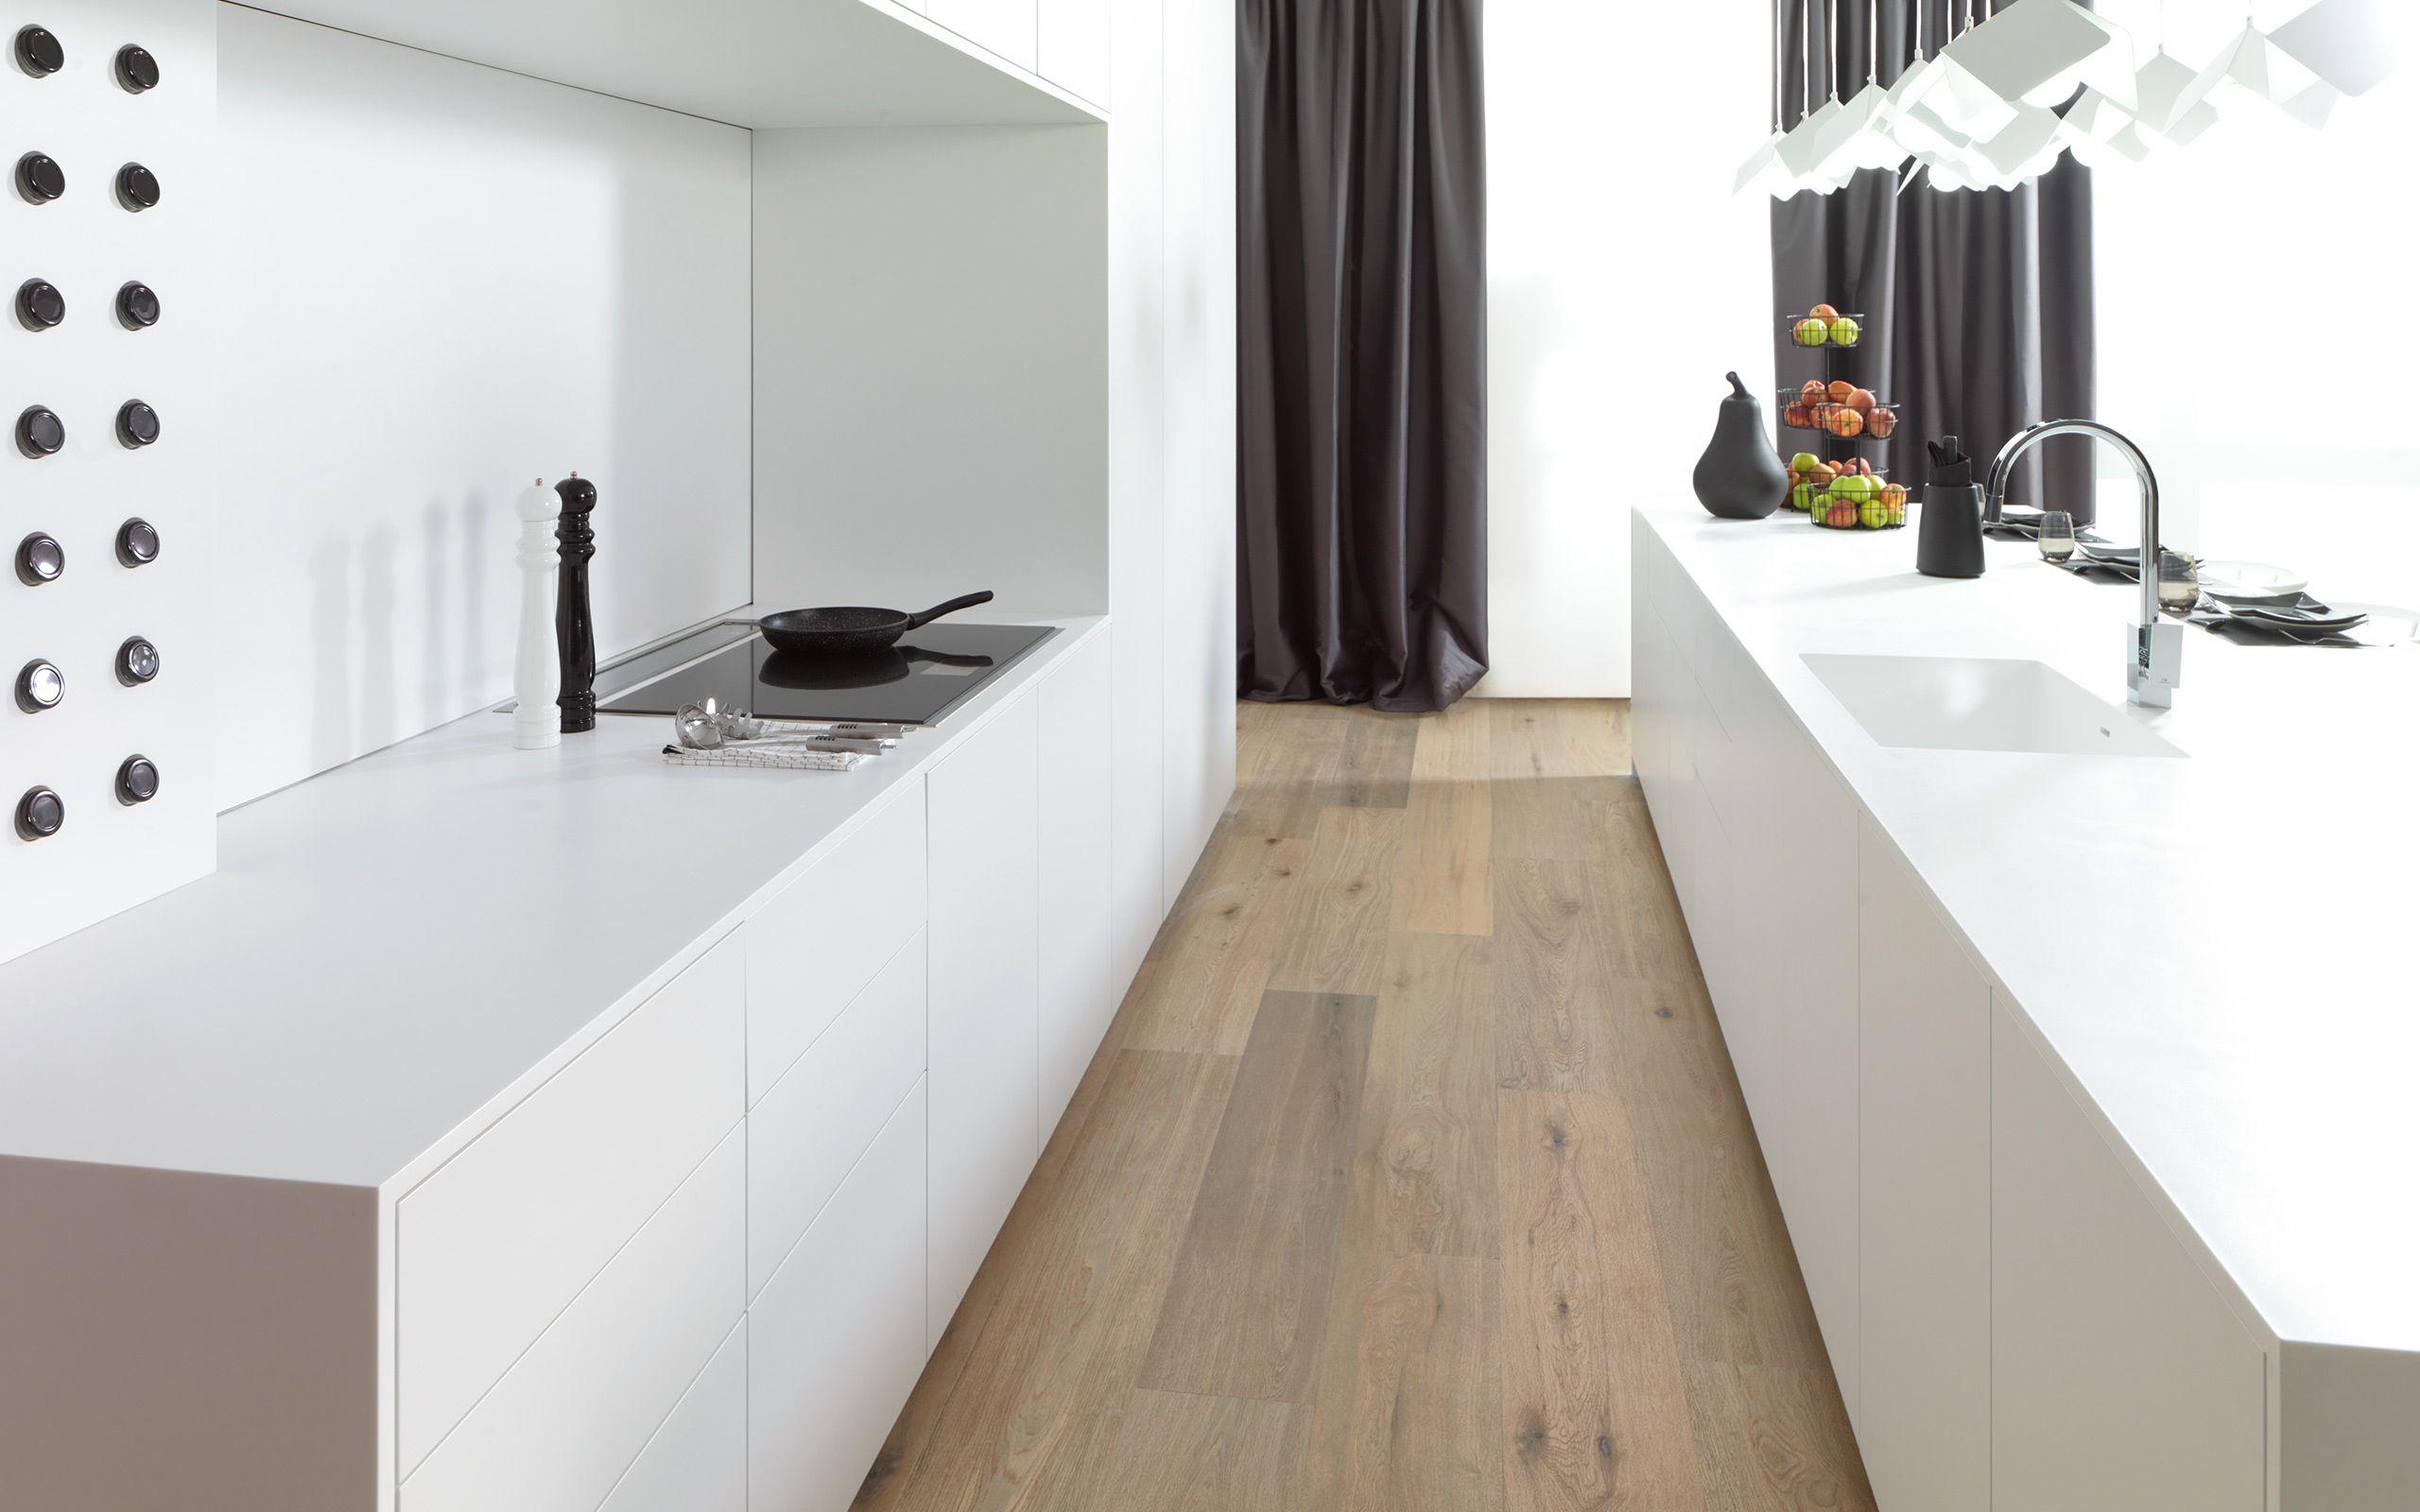 E4 00 Blanco Snow Mate Roble Puro Cocinas Kitchens Gamadecor